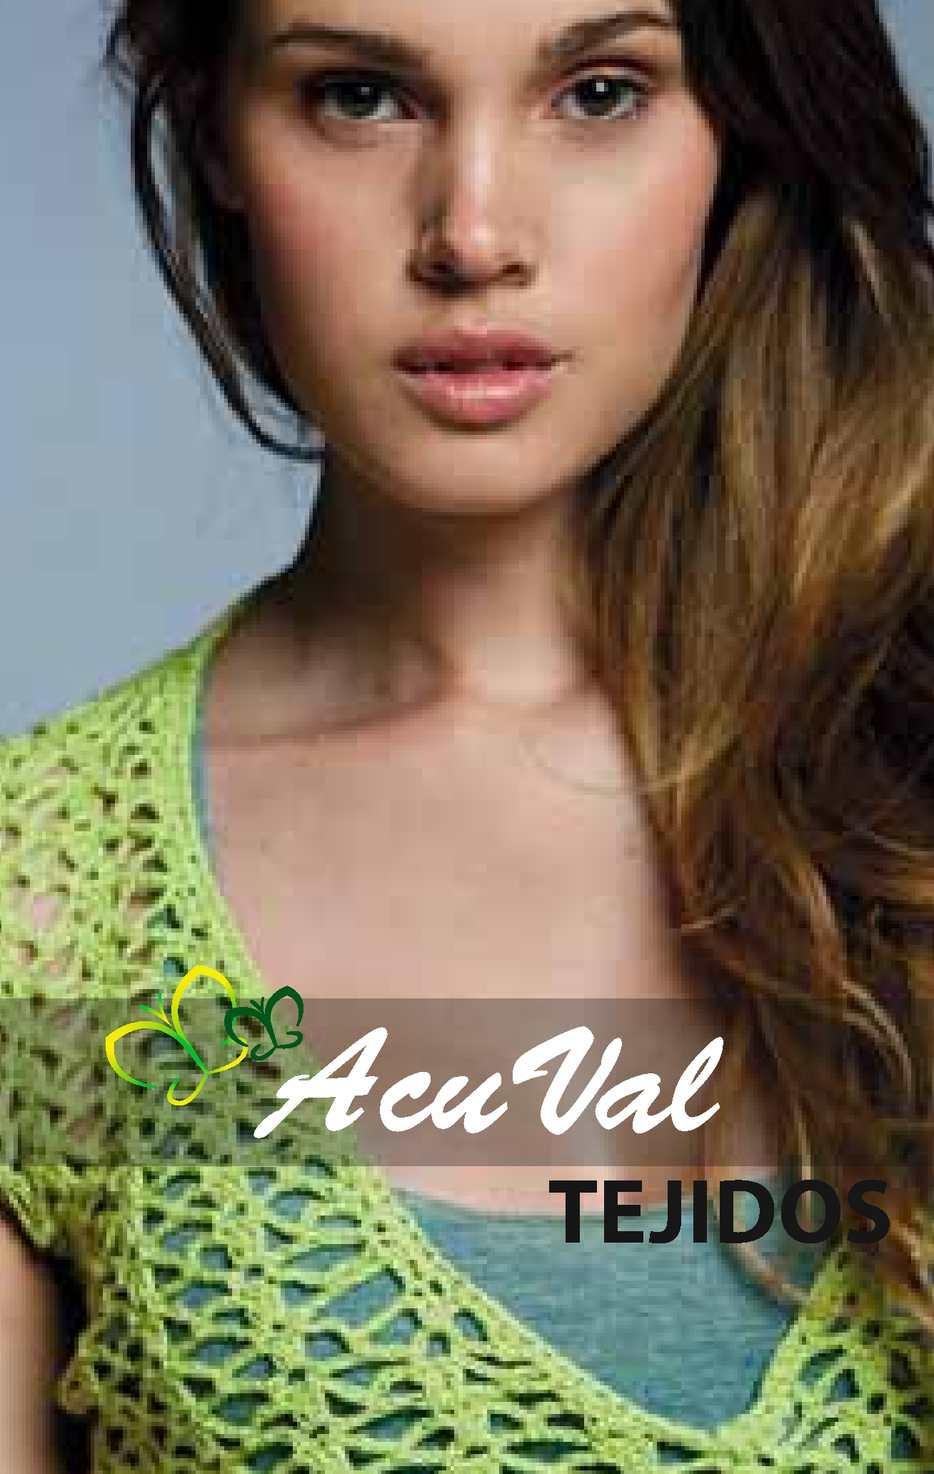 Catalogo AcuVal - Tejidos